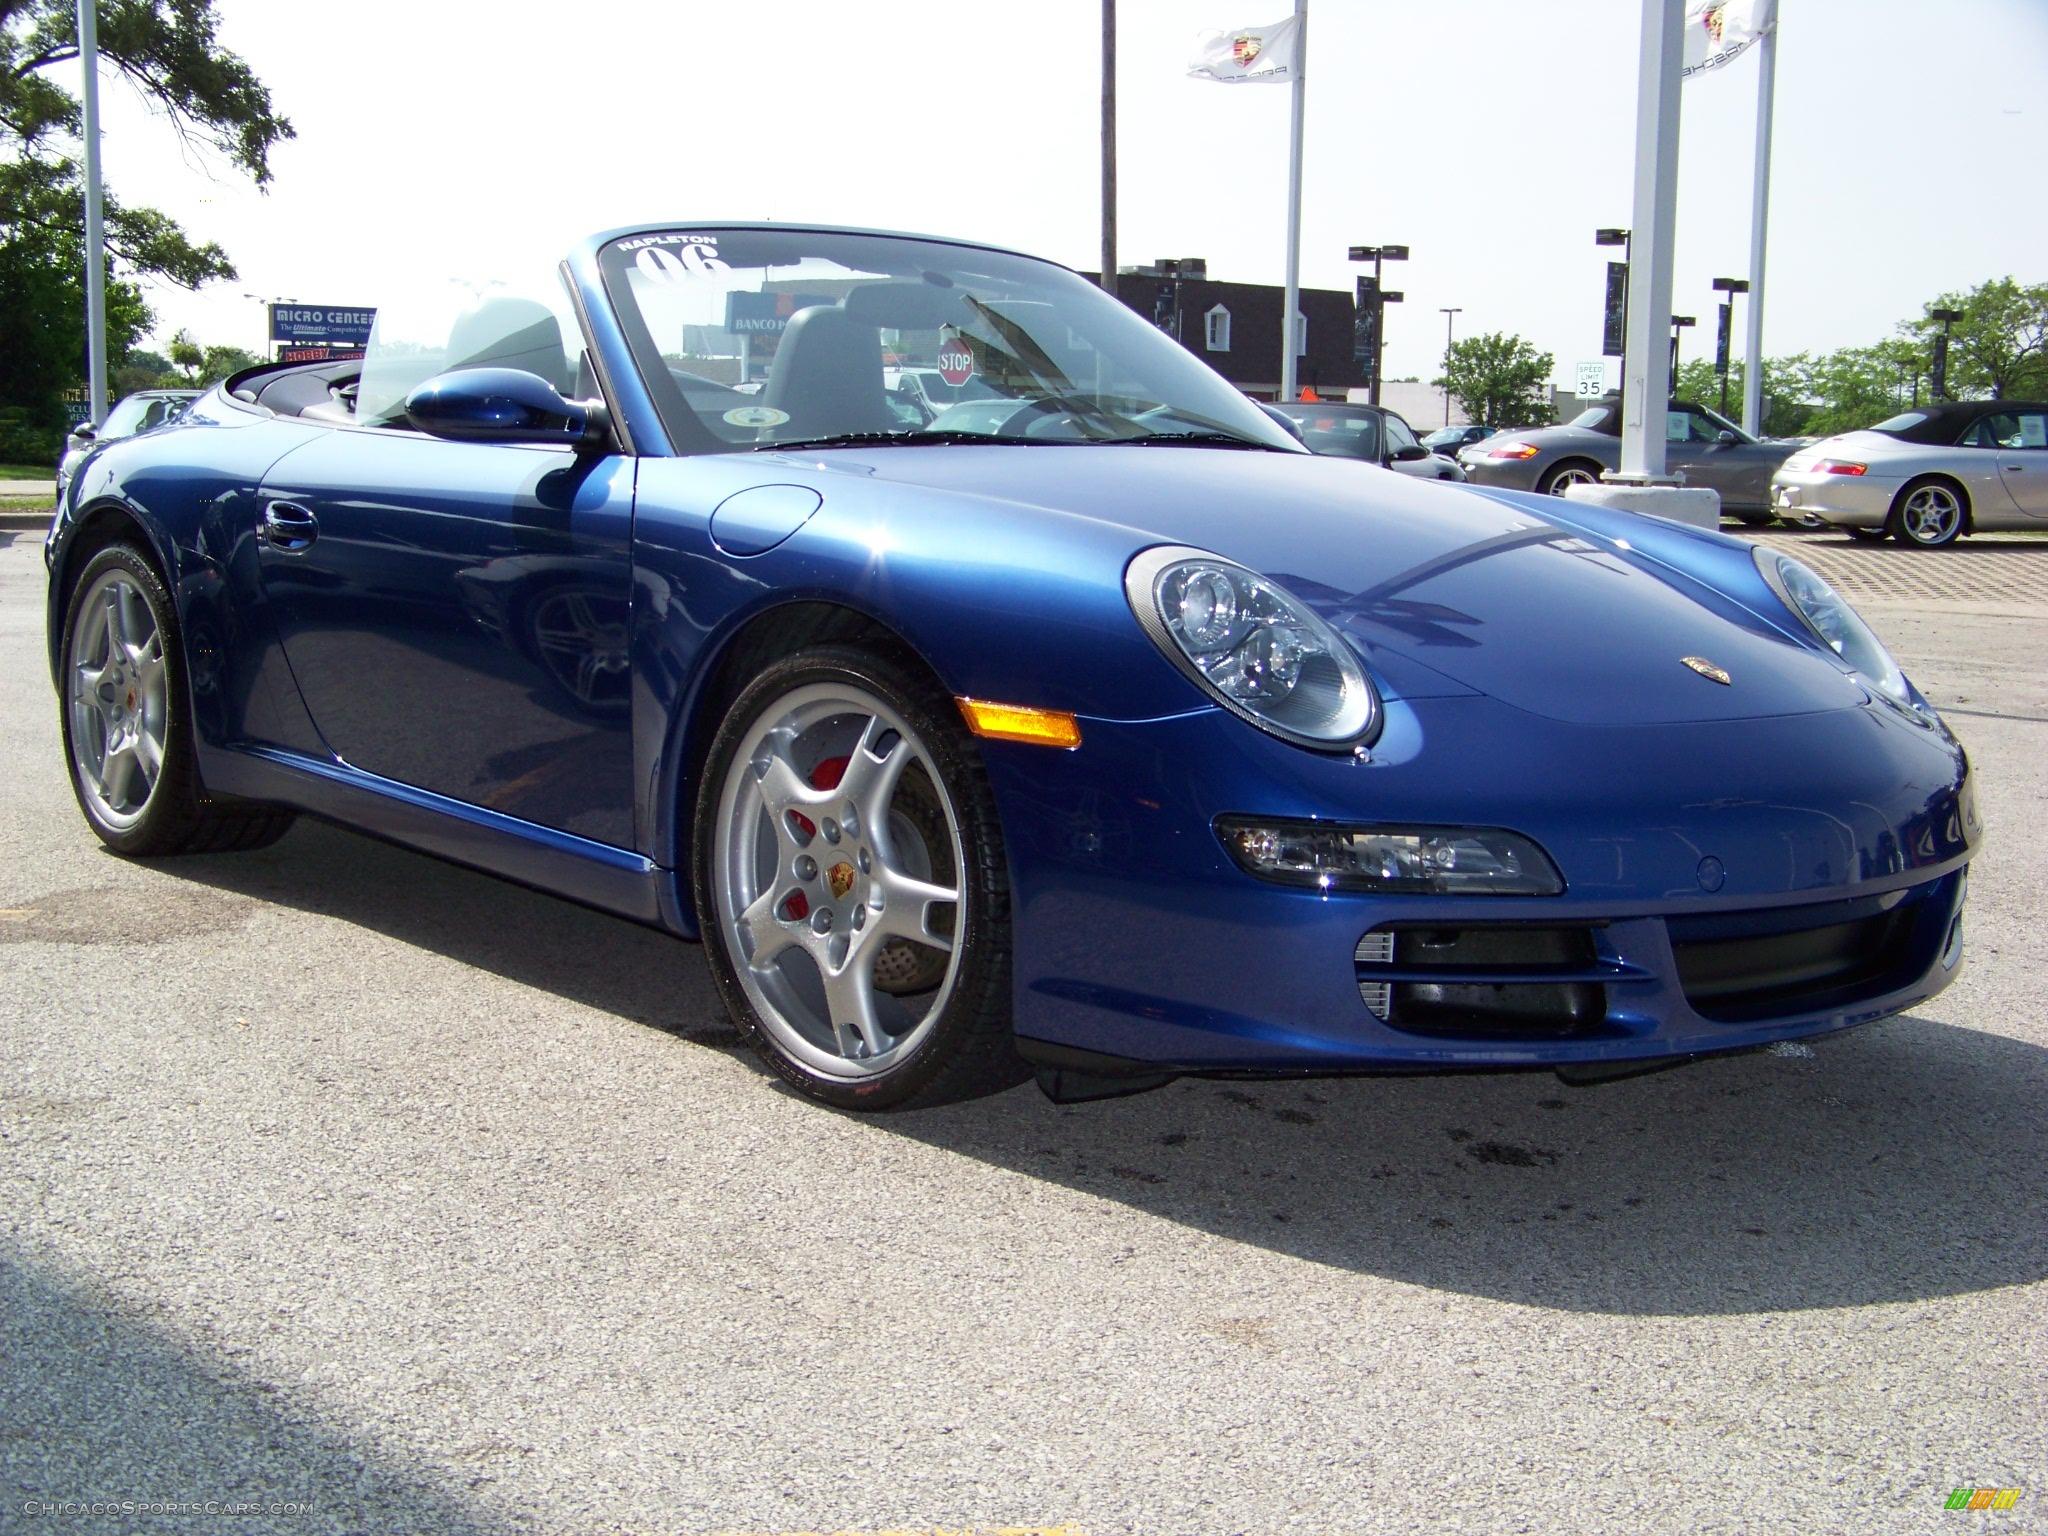 2006 Porsche 911 Carrera Cabriolet in Cobalt Blue Metallic ...